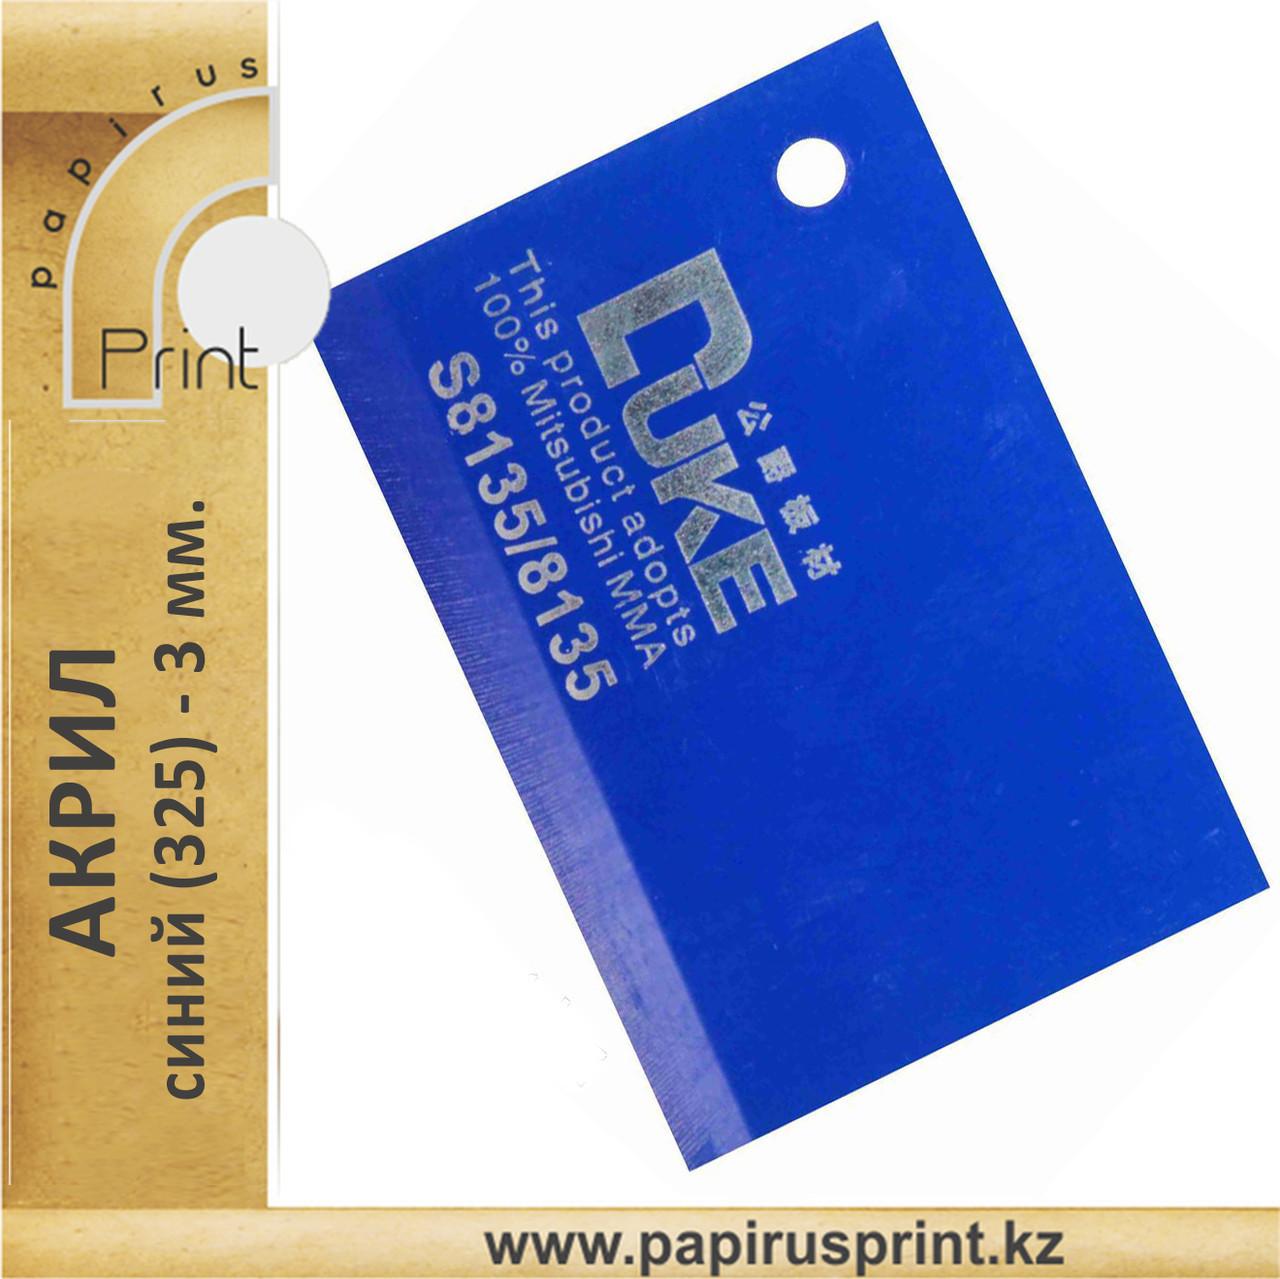 Синий акрил 3 мм №325 1.26 х 2.48 мм